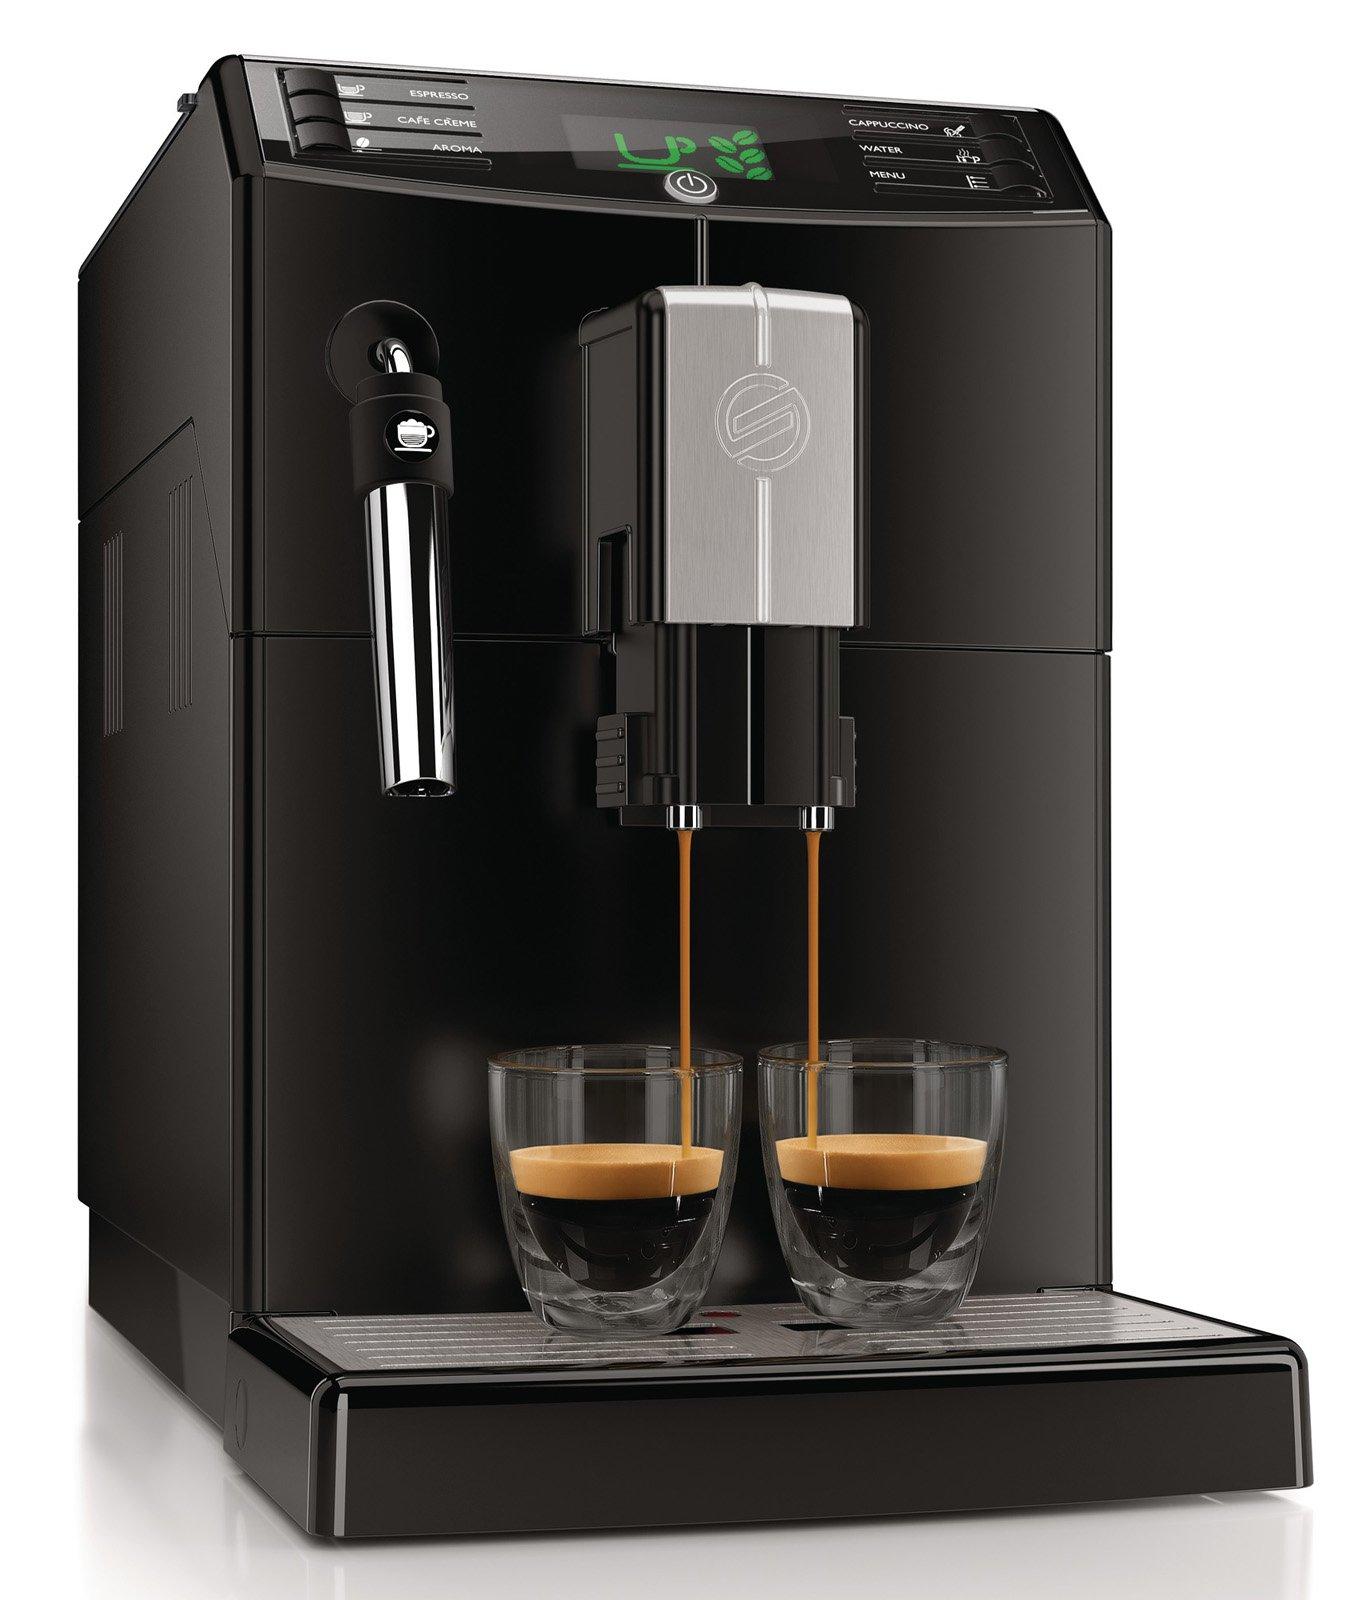 Macchine Da Caffe Per Lespresso In Casa